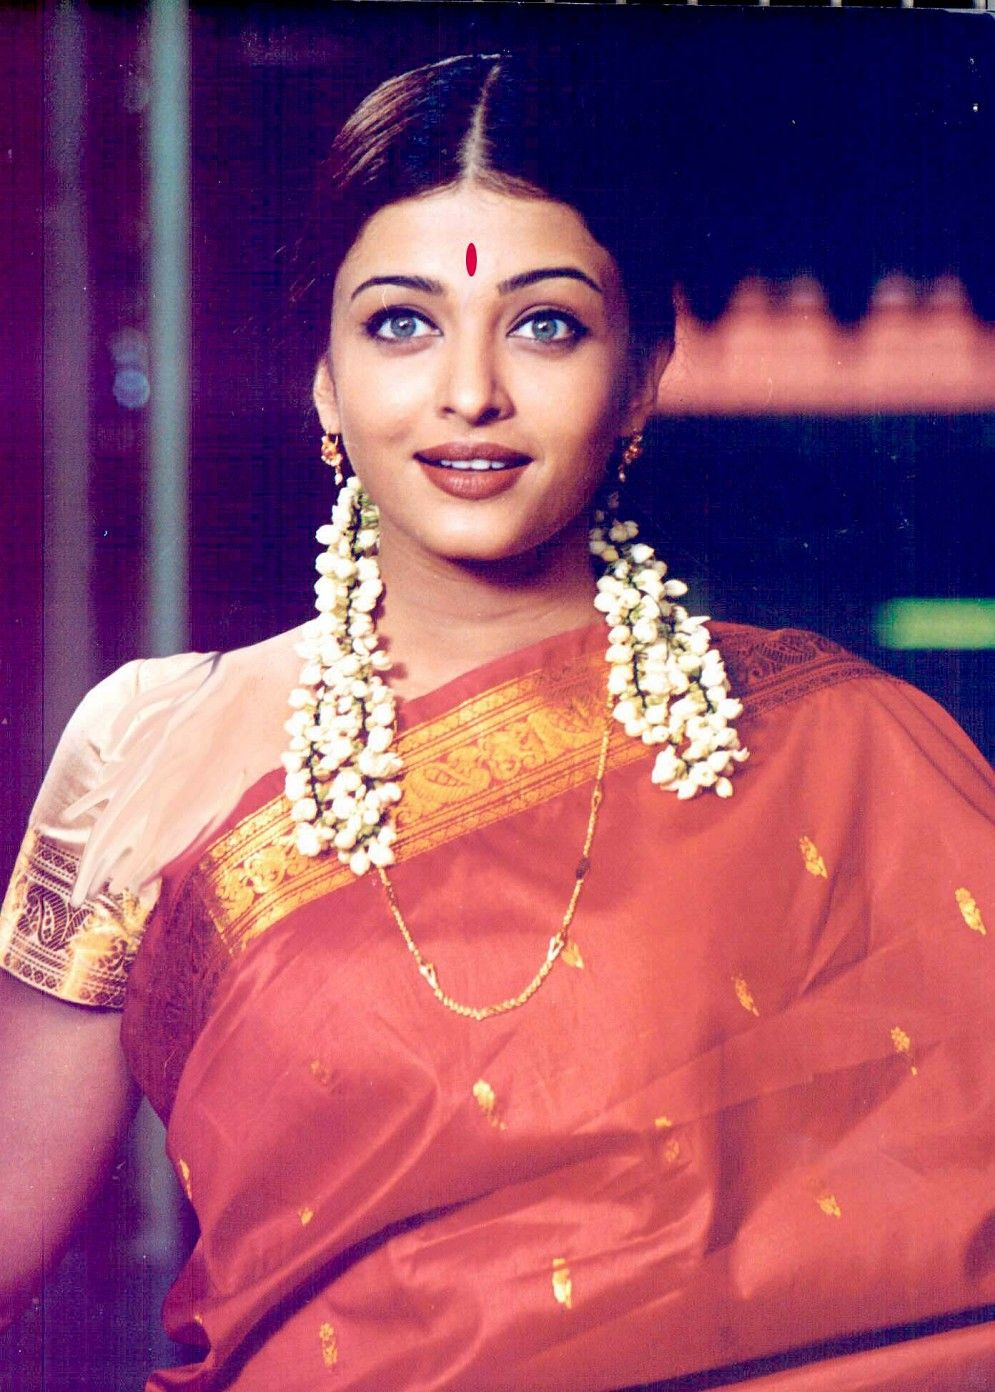 Aishwarya Rai Red Sari Aishwarya Rai Looks Like Tamil Girl In Red Saree Photos Most Beautiful Indian Actress Beautiful Indian Actress Aishwarya Rai Hairstyle